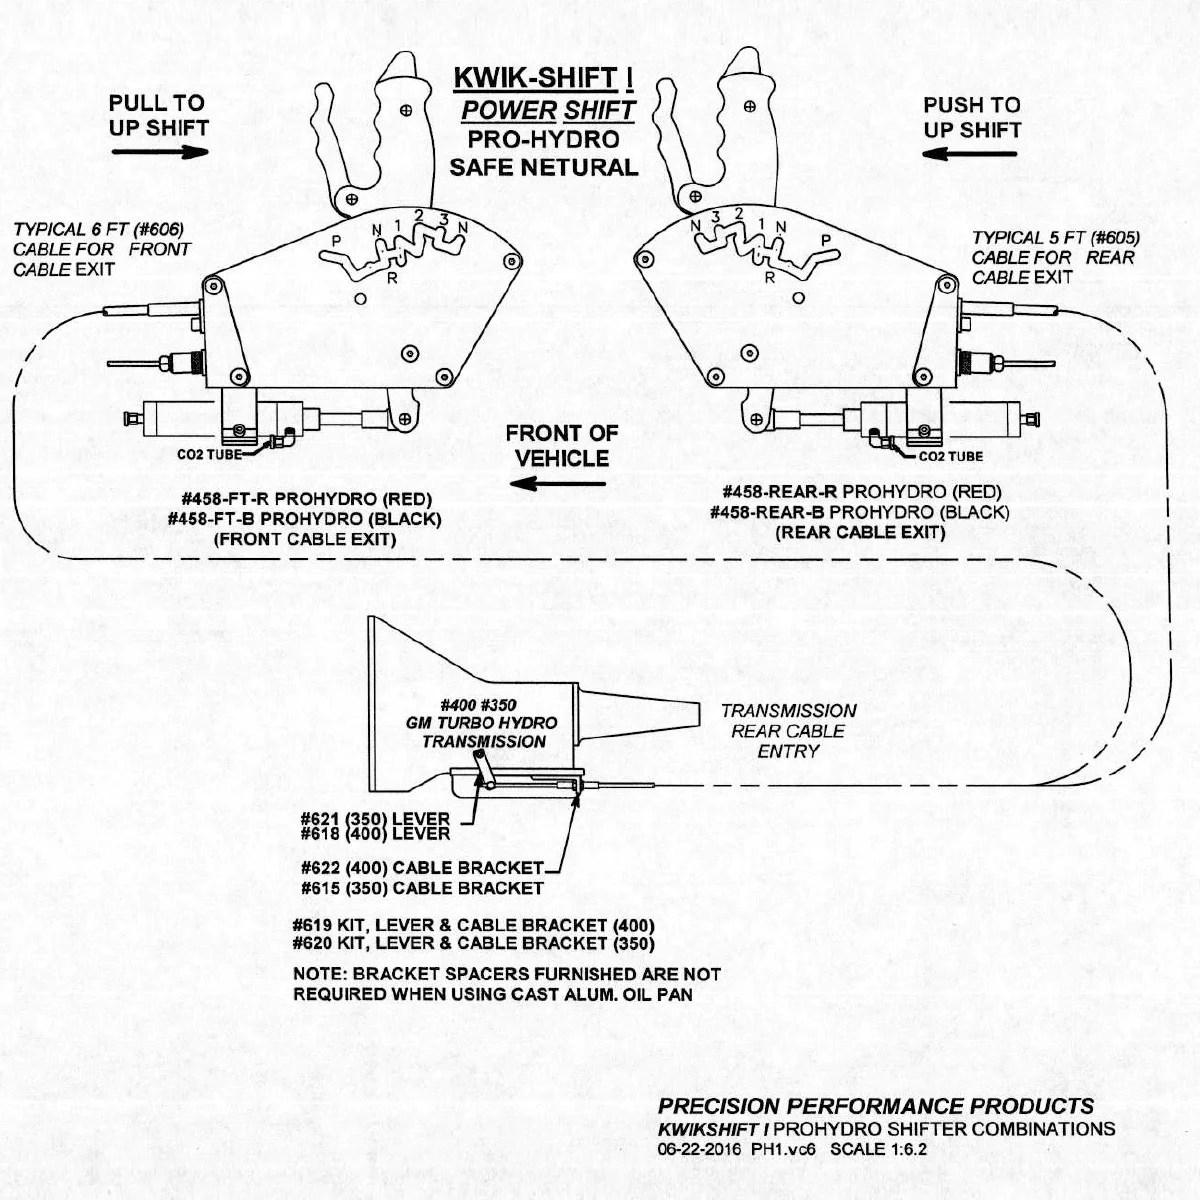 th400 sensor diagram wiring diagrams scematic th400 no reverse th400 sensor diagram [ 1200 x 1200 Pixel ]